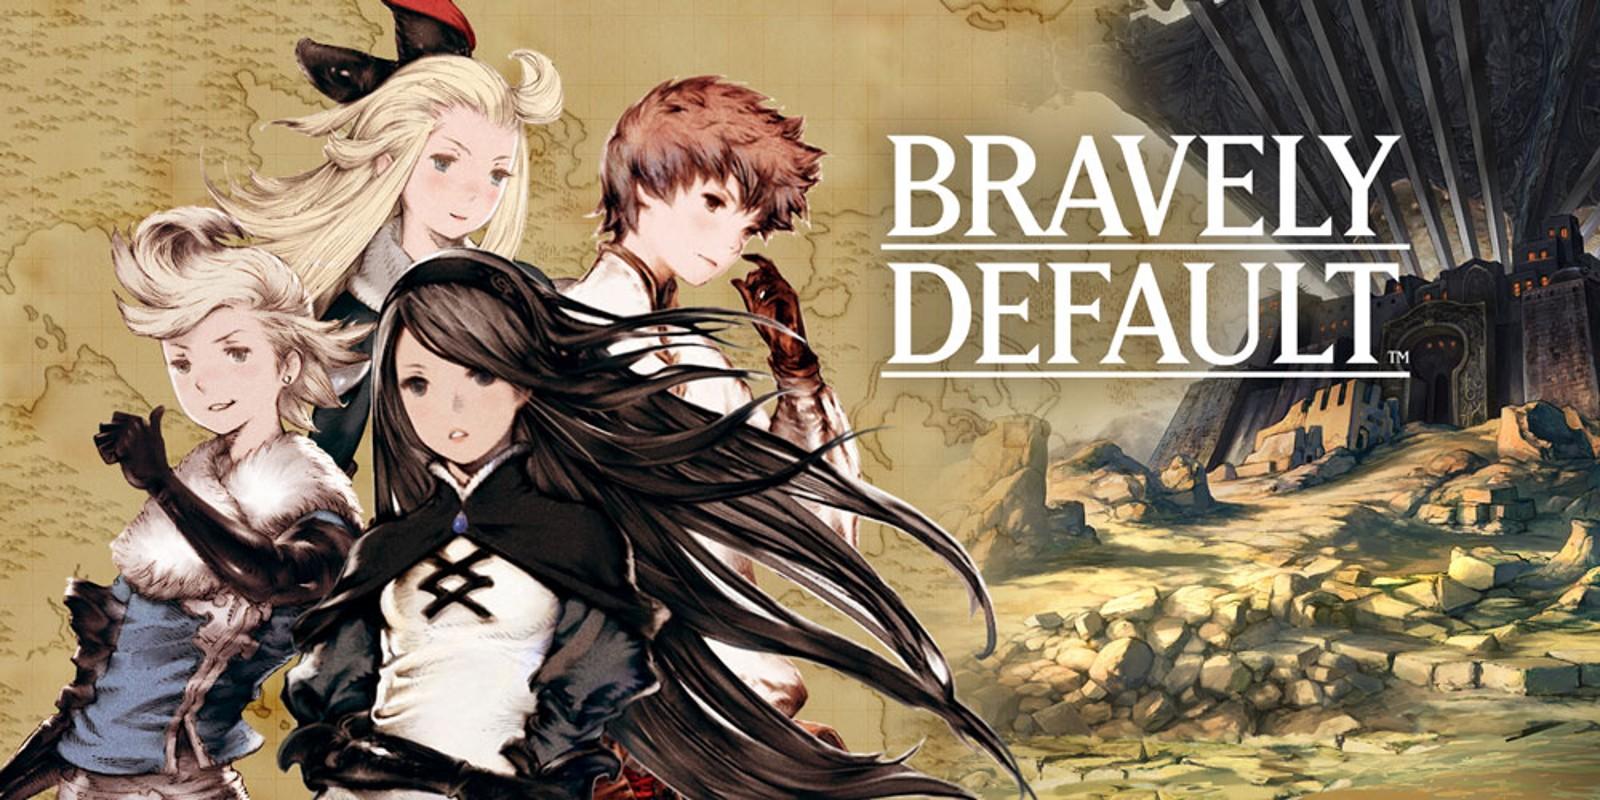 Filosofia - Bravely Default